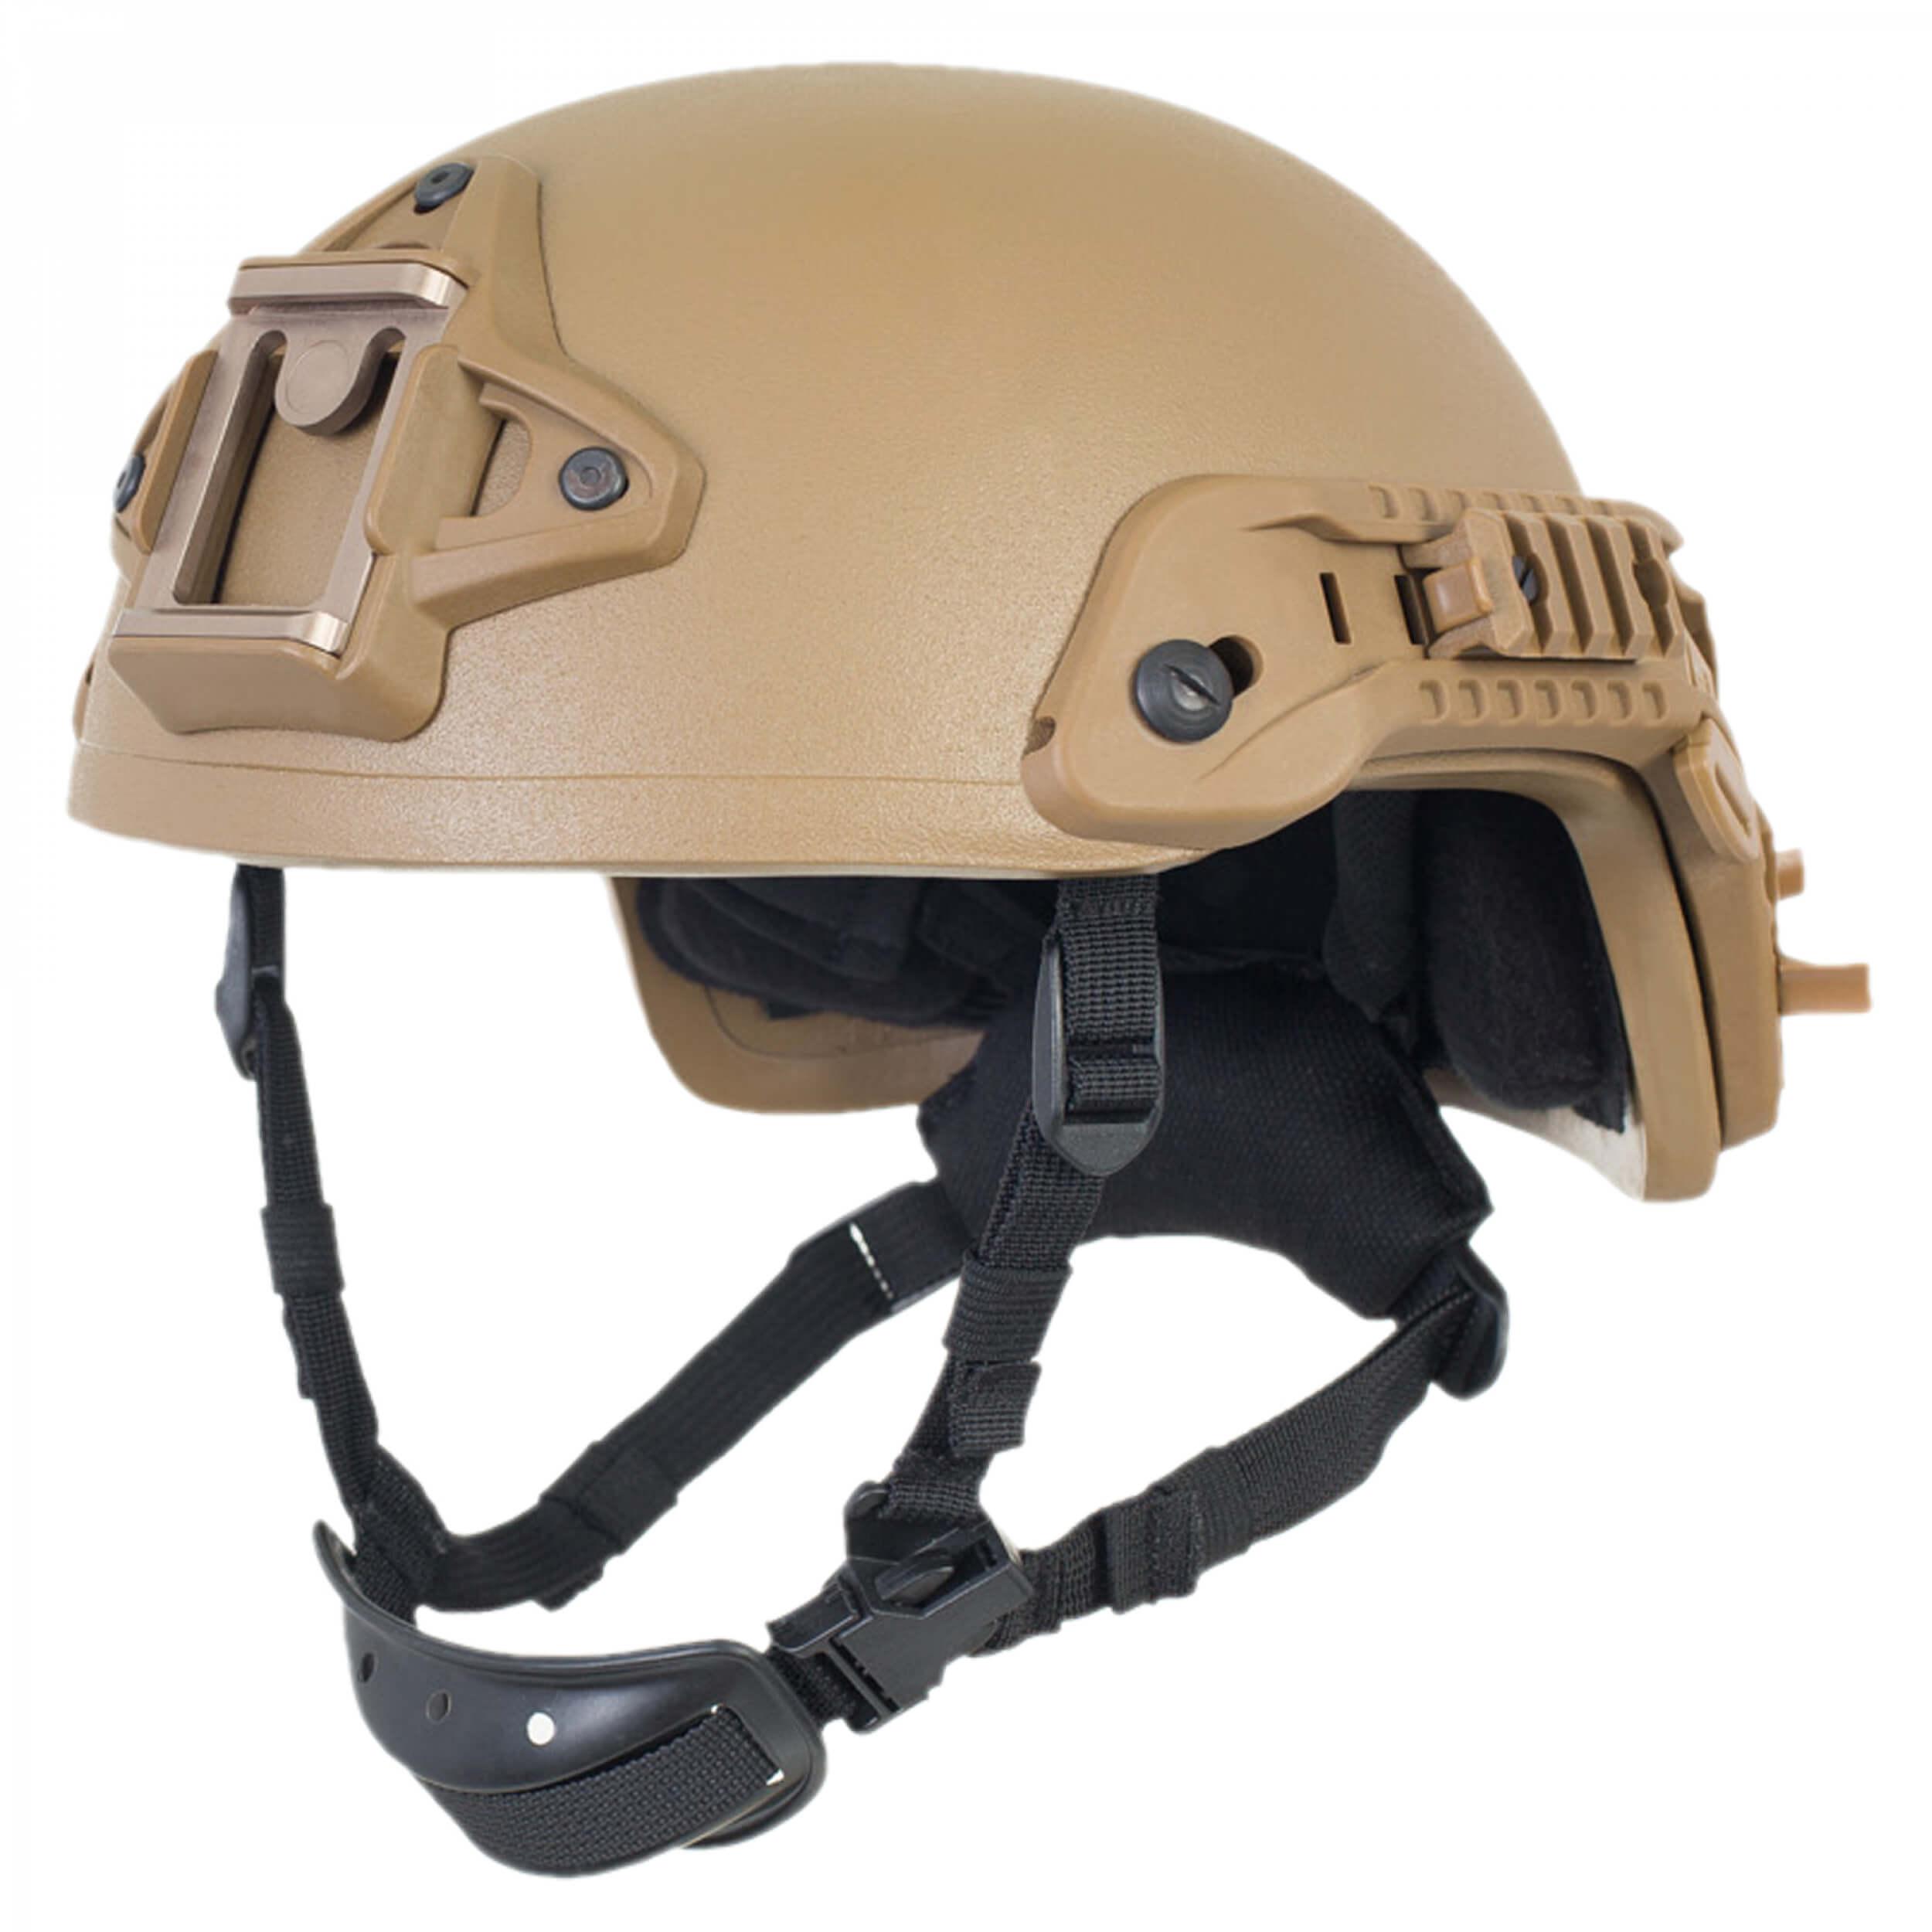 HCS Viper 3 SHC Helm mit Rails NVG Mount und Pad-System coyote